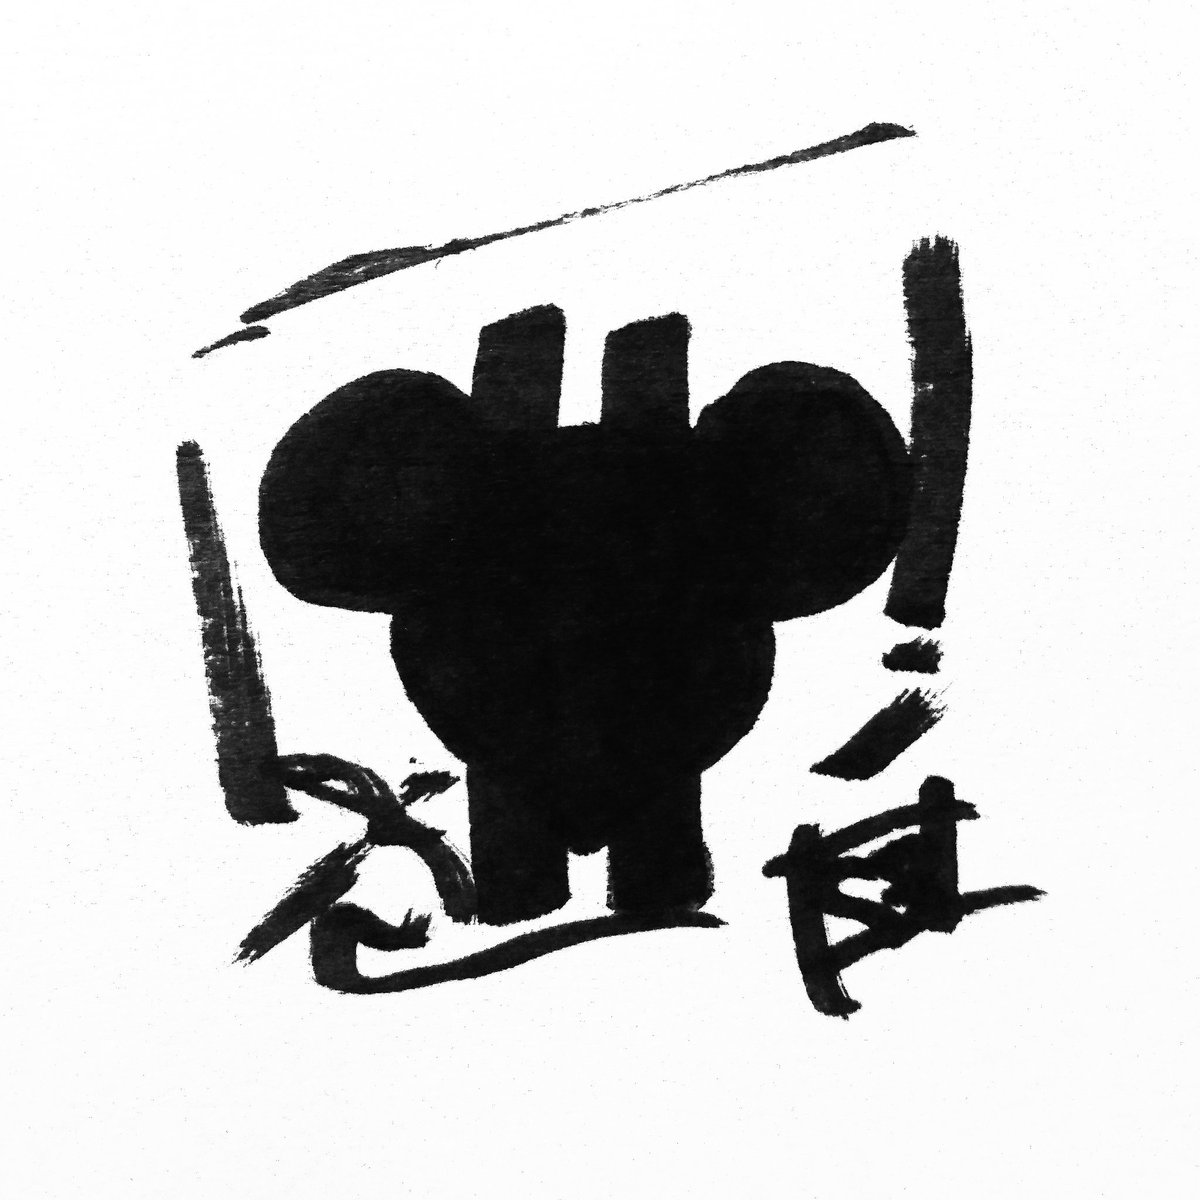 Day26 Squeak  #Inktober #art #artsy #arte #illustration #askacurator <br>http://pic.twitter.com/UiUimndpYU